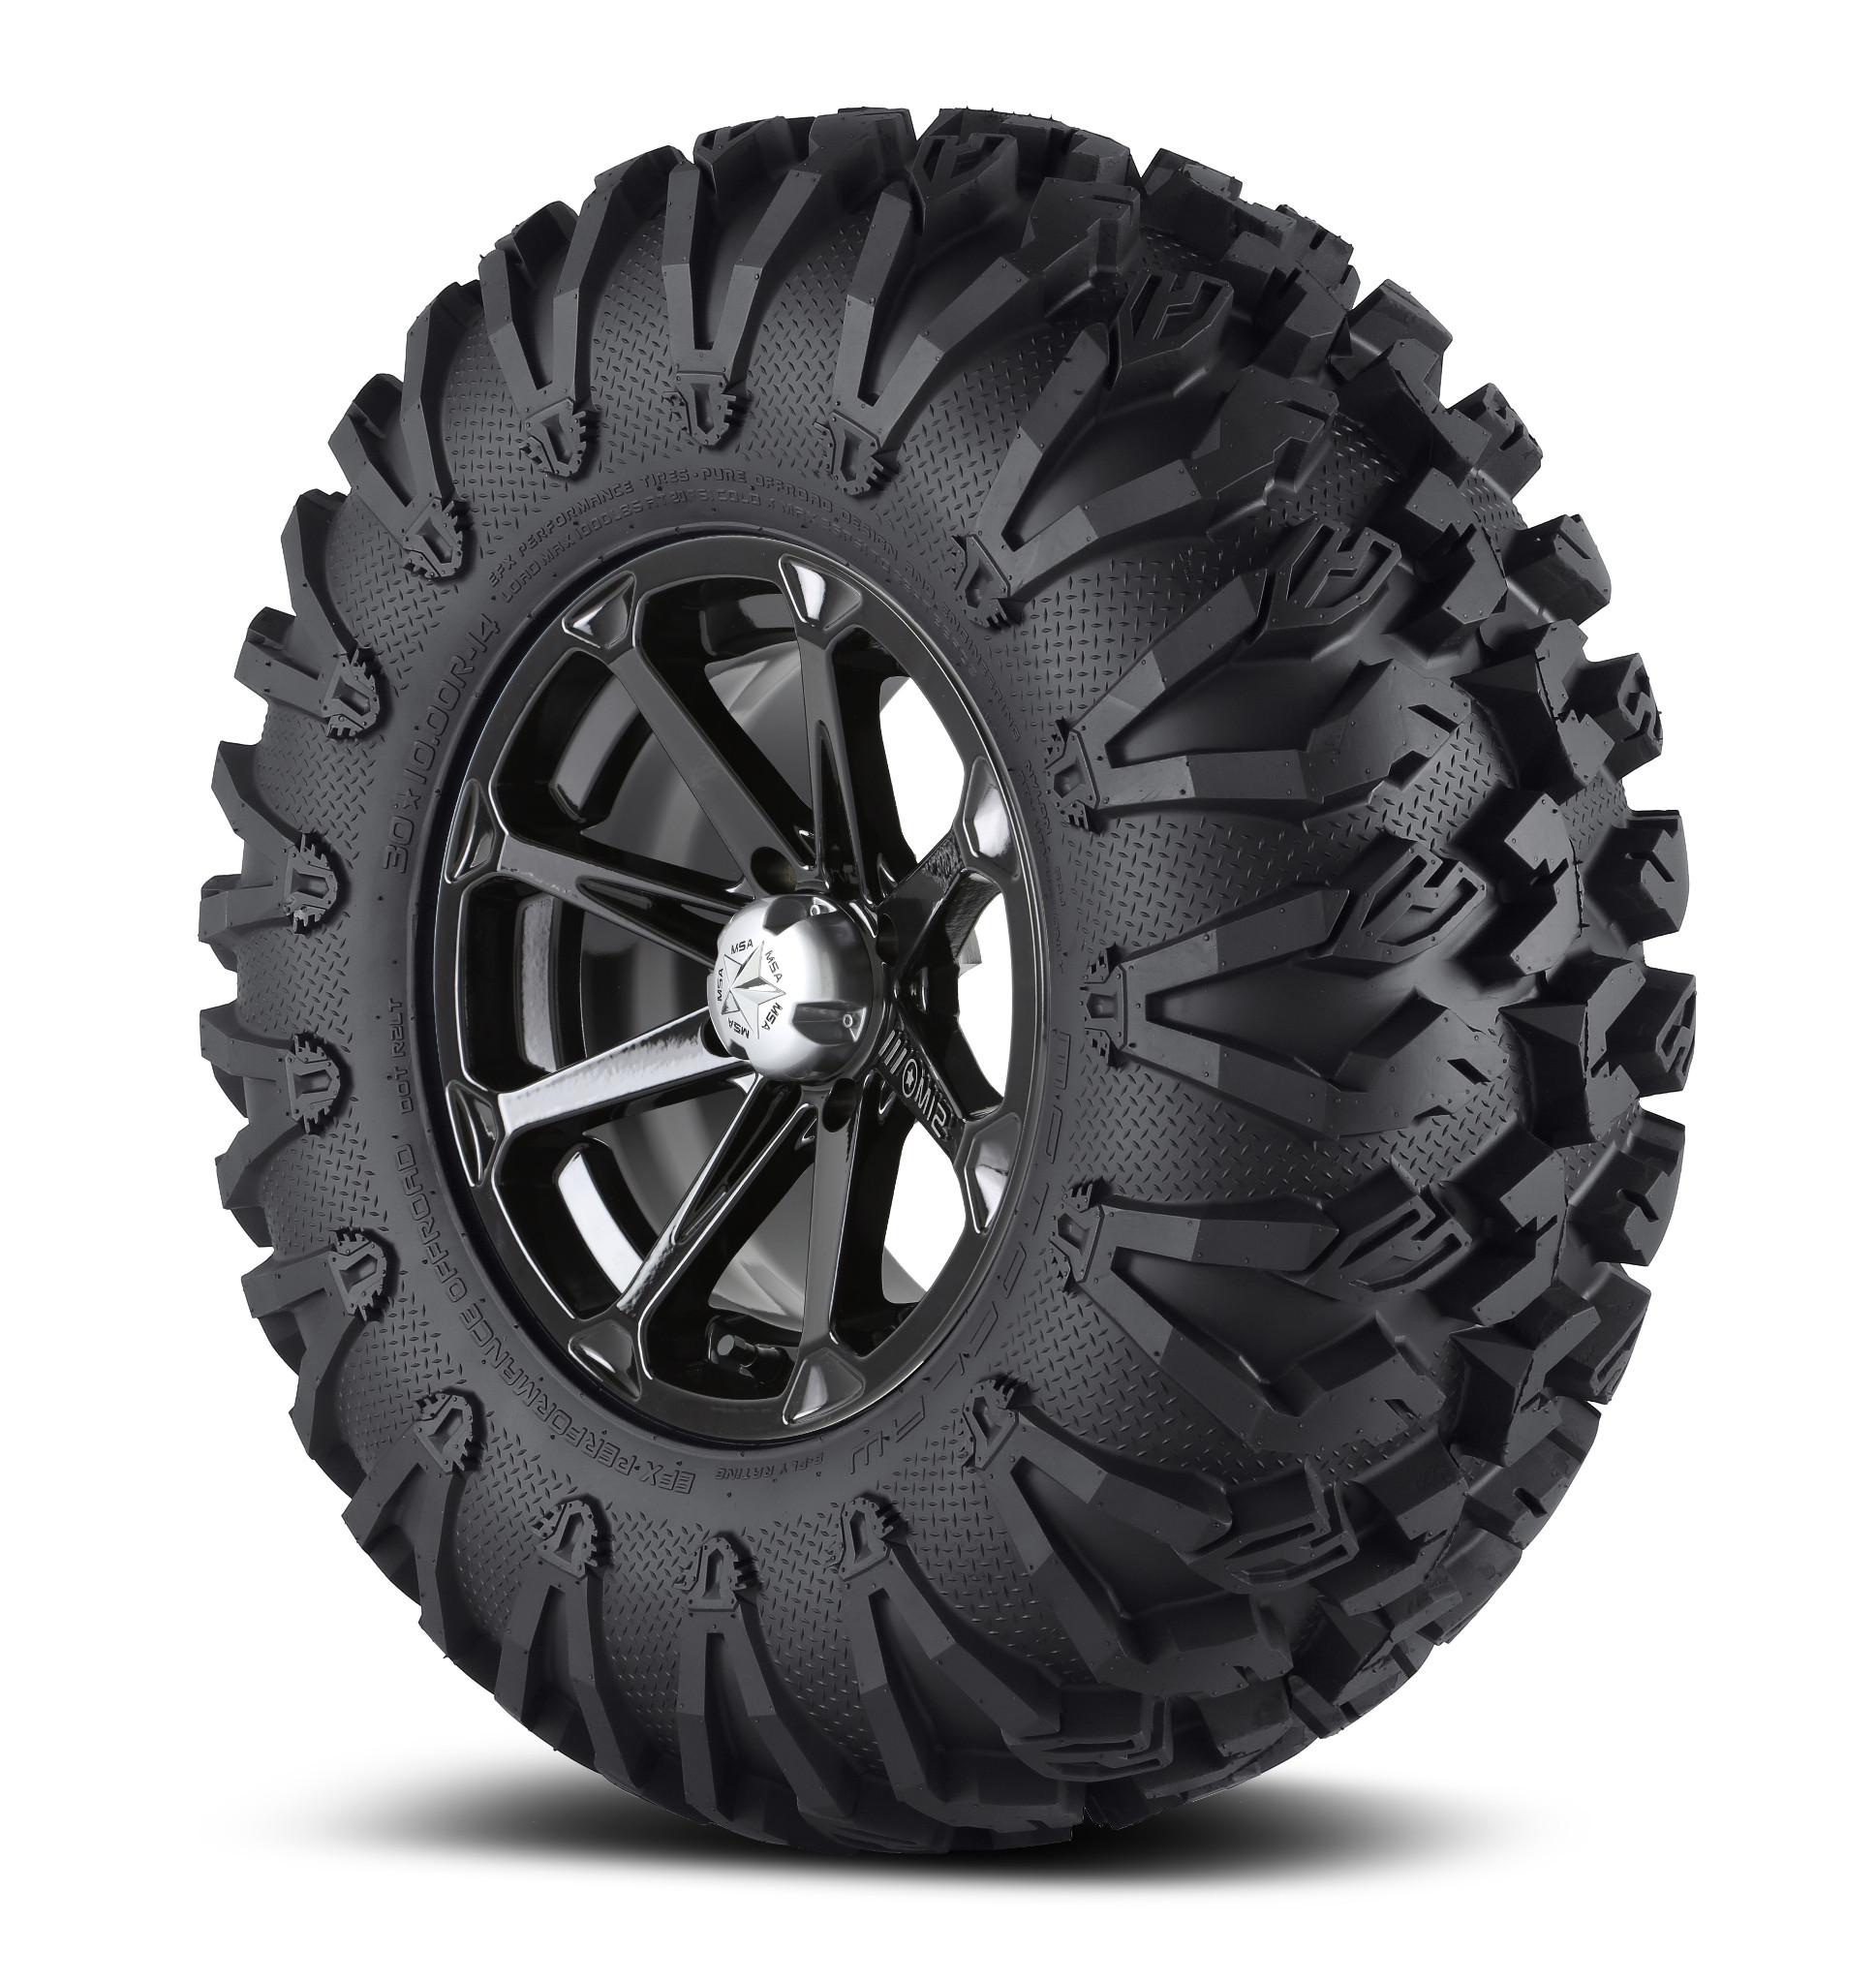 msa 18x7 m12 diesel wheel and efx 33 moto claw tire dark tint kit. Black Bedroom Furniture Sets. Home Design Ideas